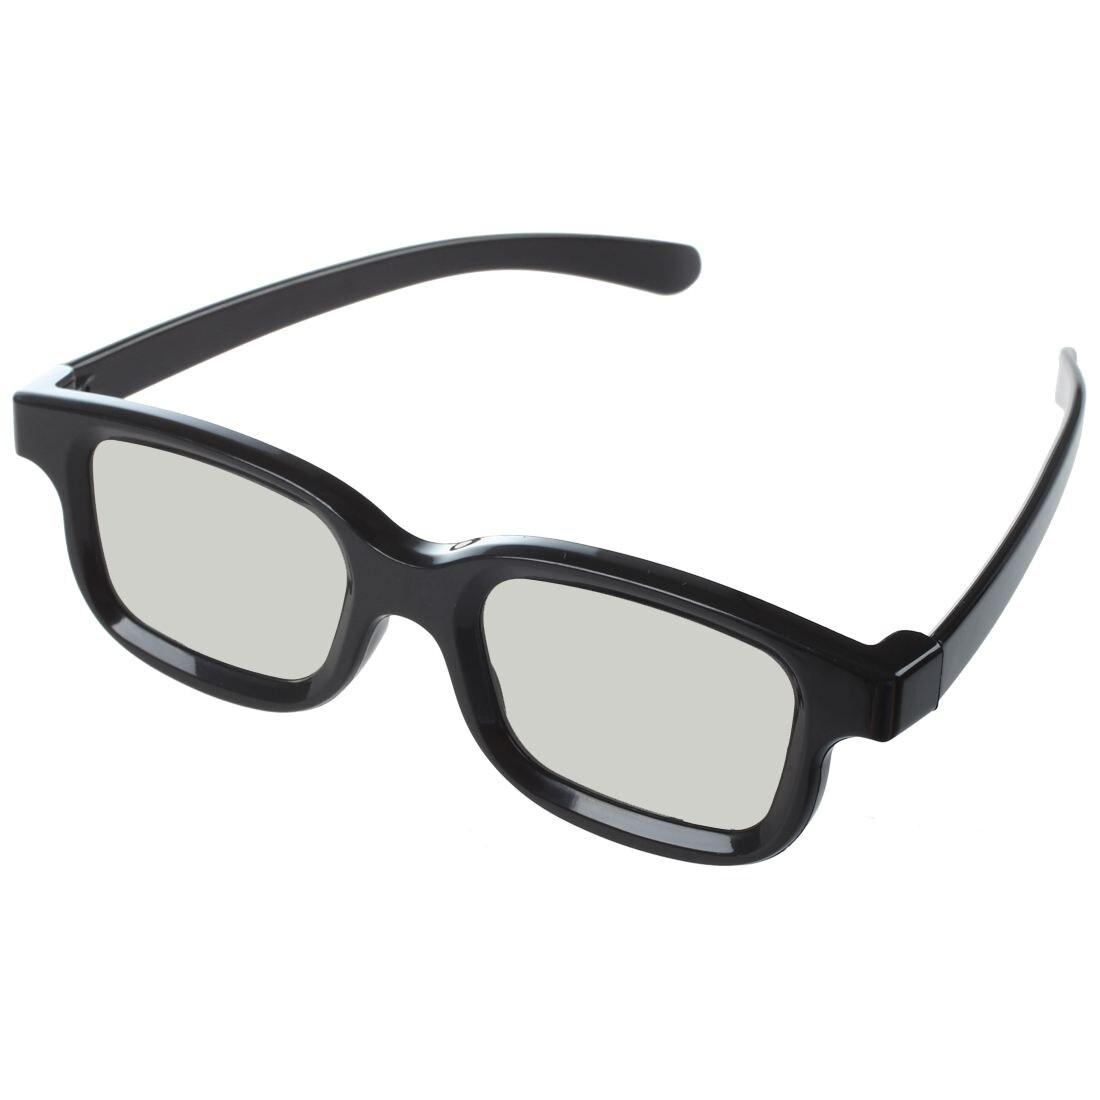 Top Deals 3D Glasses For LG Cinema 3D TV's - 2 Pairs